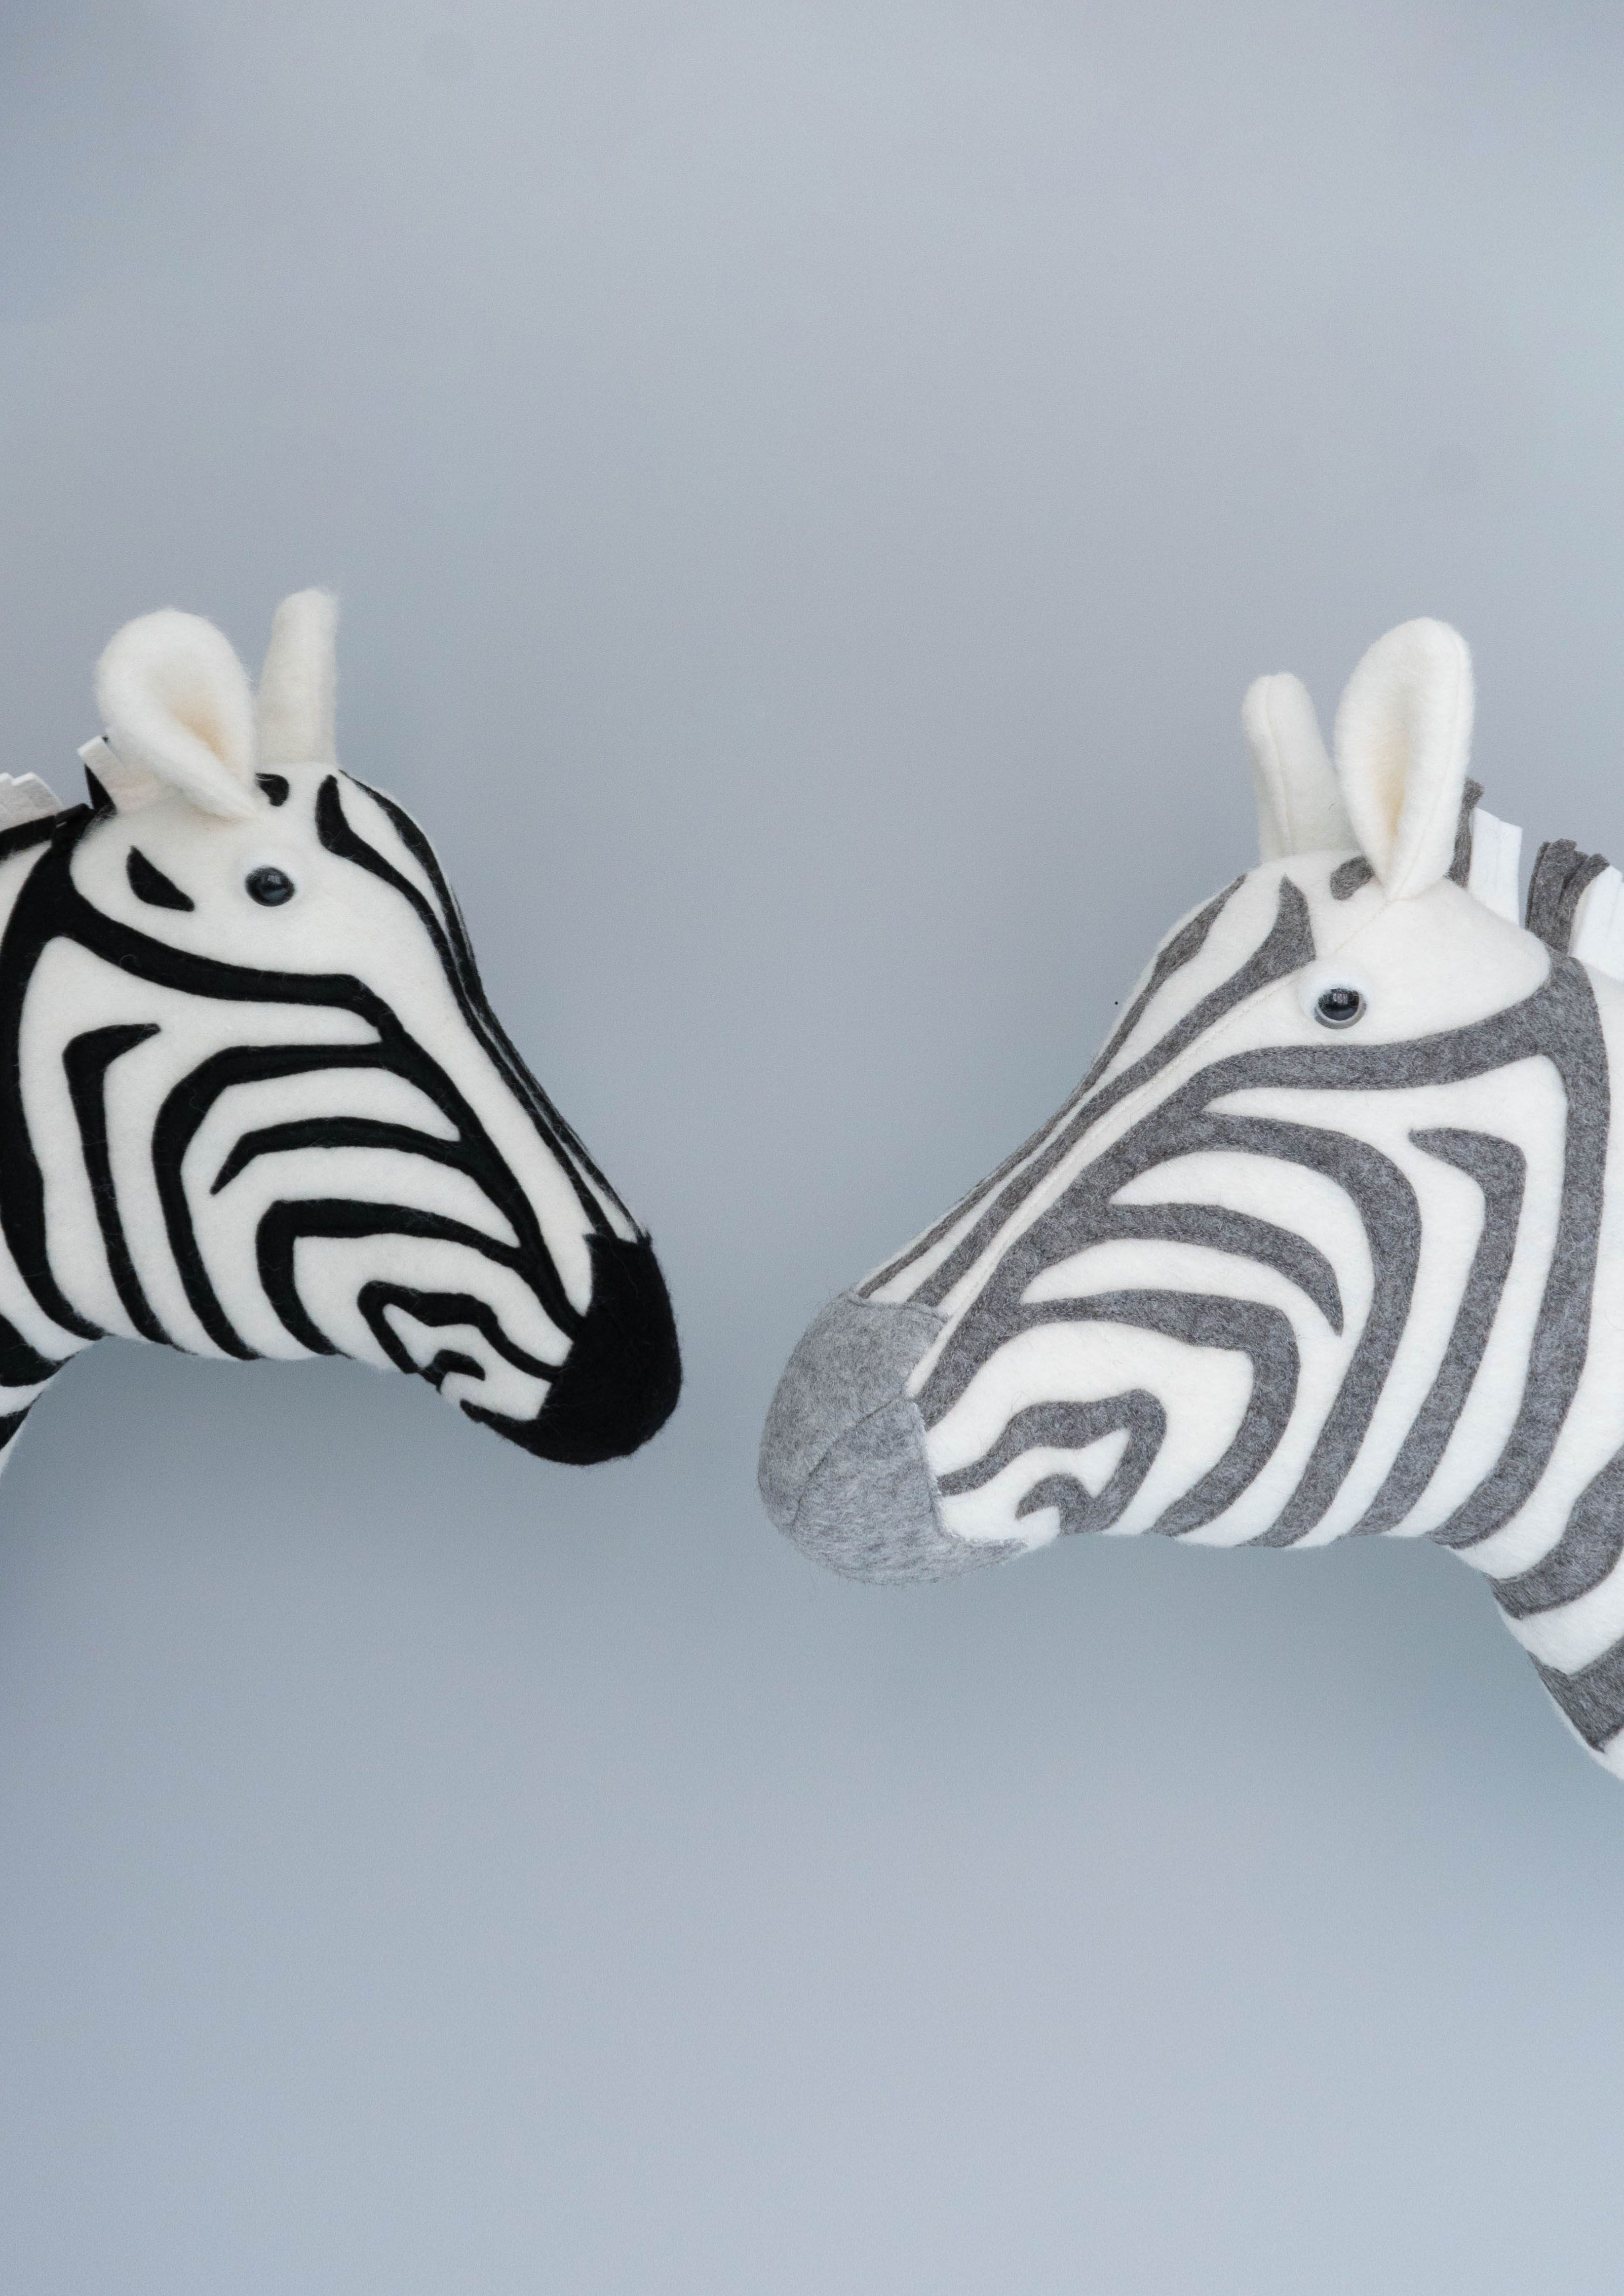 Zebra Head Wall Decor Faux Taxidermy Safari Nursery Decor Etsy In 2020 Safari Nursery Decor Animal Head Decor Faux Taxidermy Nursery #safari #wall #decor #for #living #room